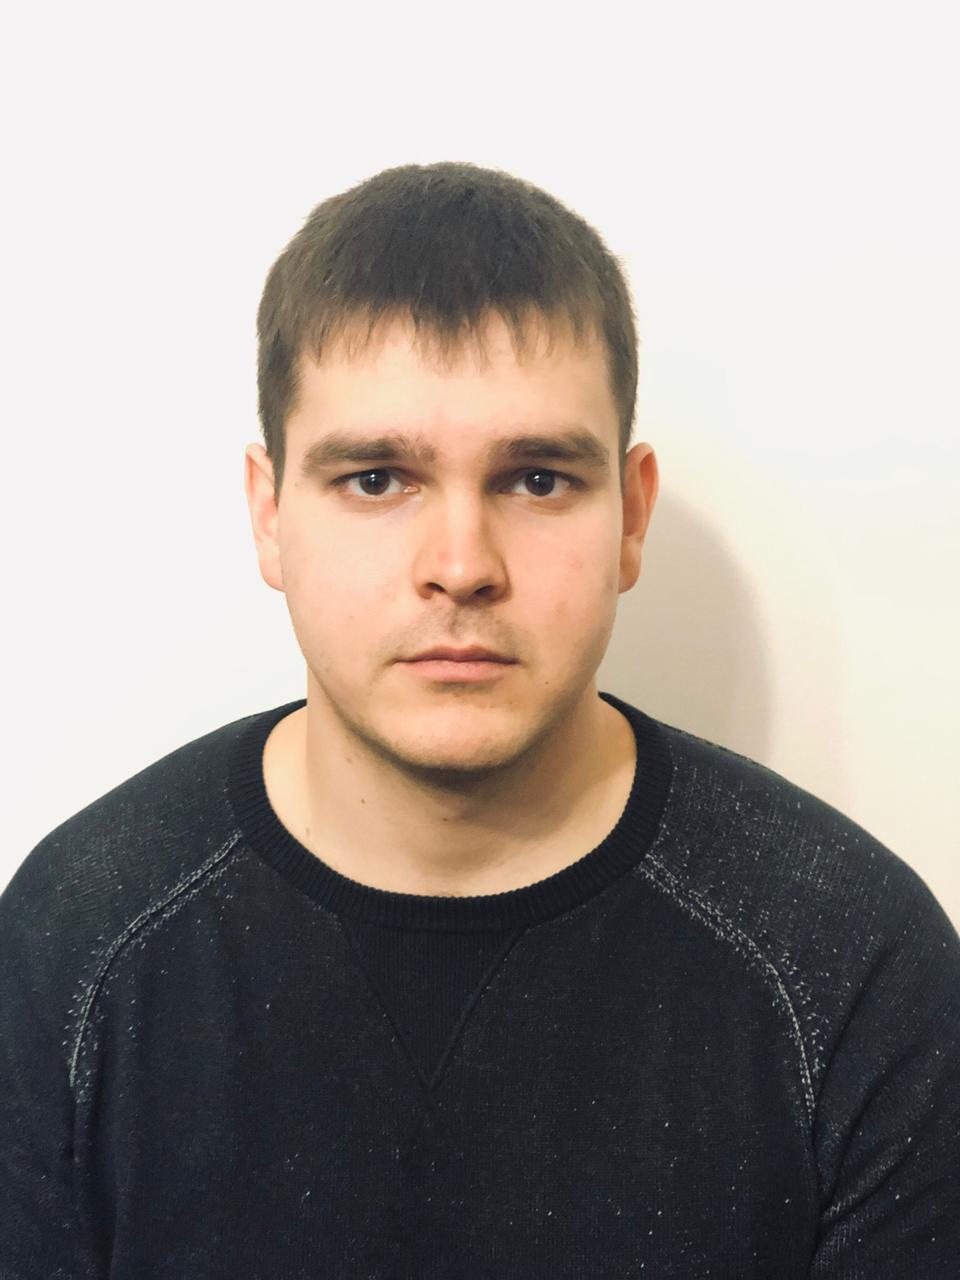 Скородумов Евгений - РЦ Атмосфера